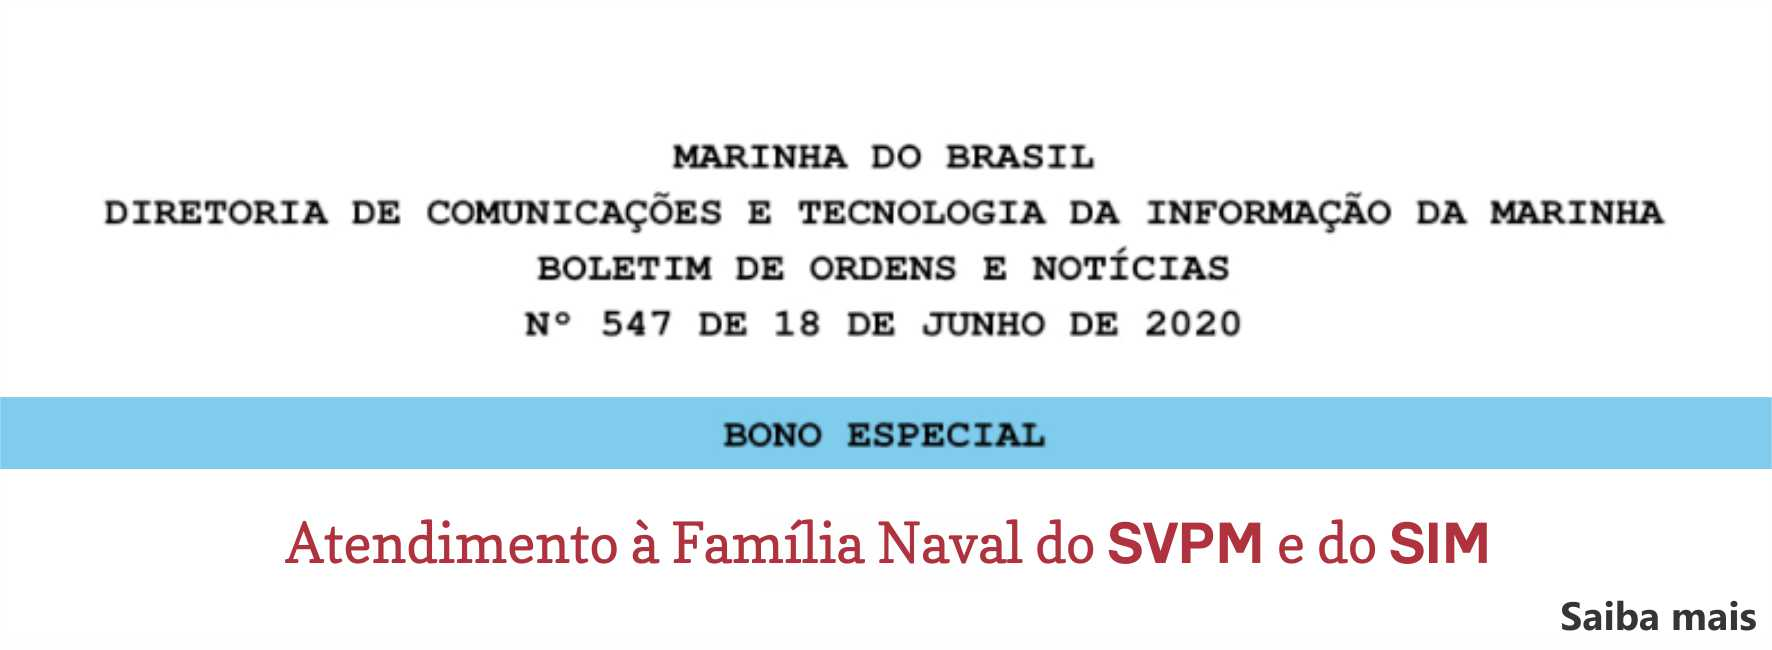 https://www.clubenaval.org.br/novo/?q=bono-especial-atendimento-%C3%A0-fam%C3%ADlia-naval-da-dpmm